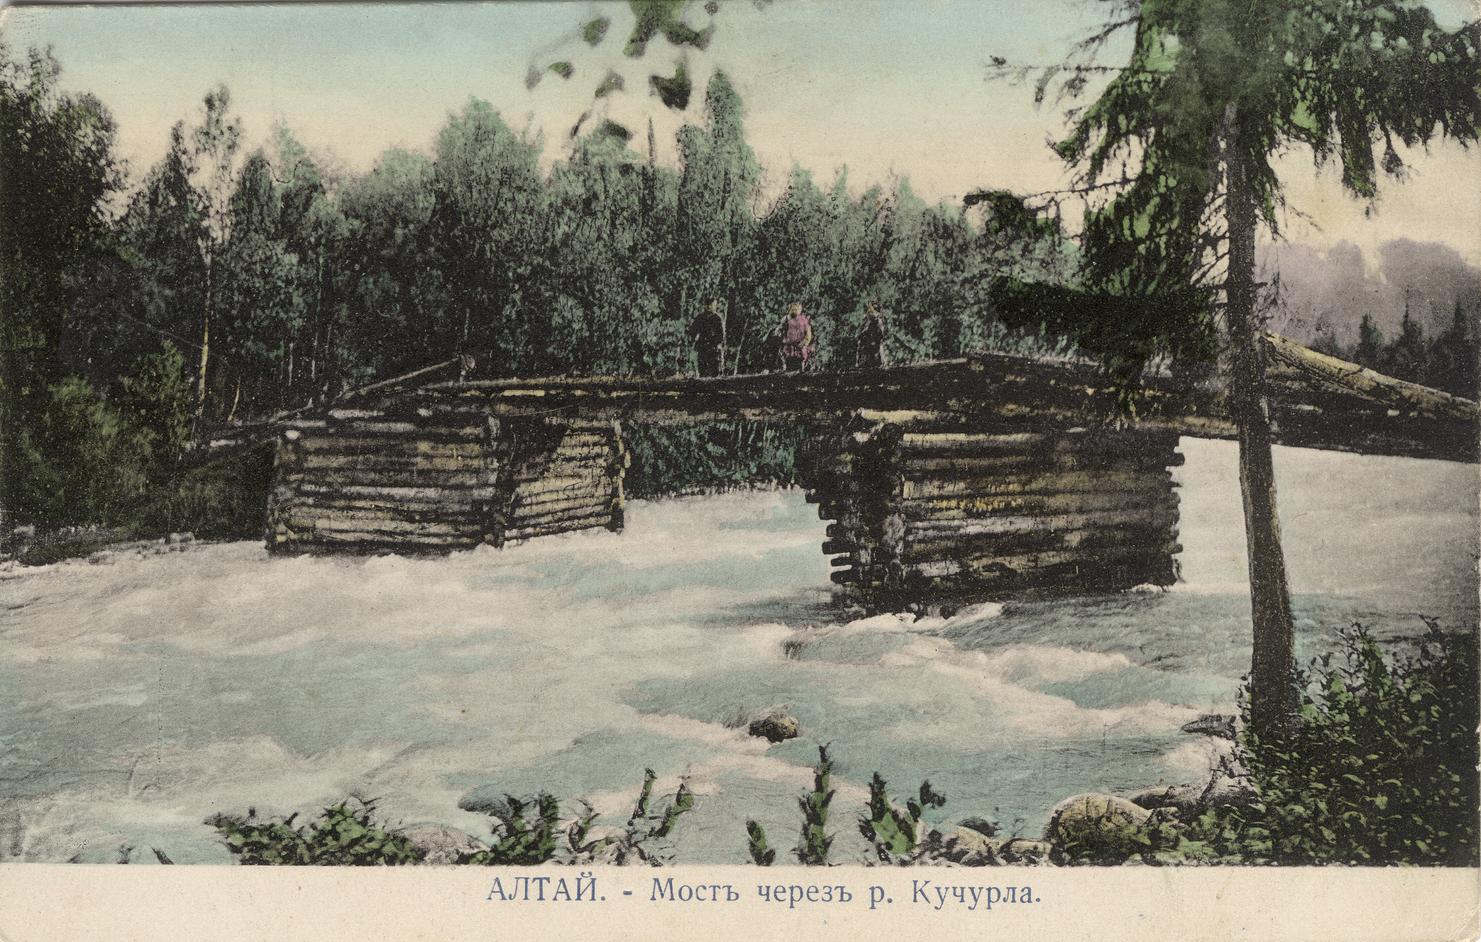 Мост через реку Кучурла, приток реки Катунь